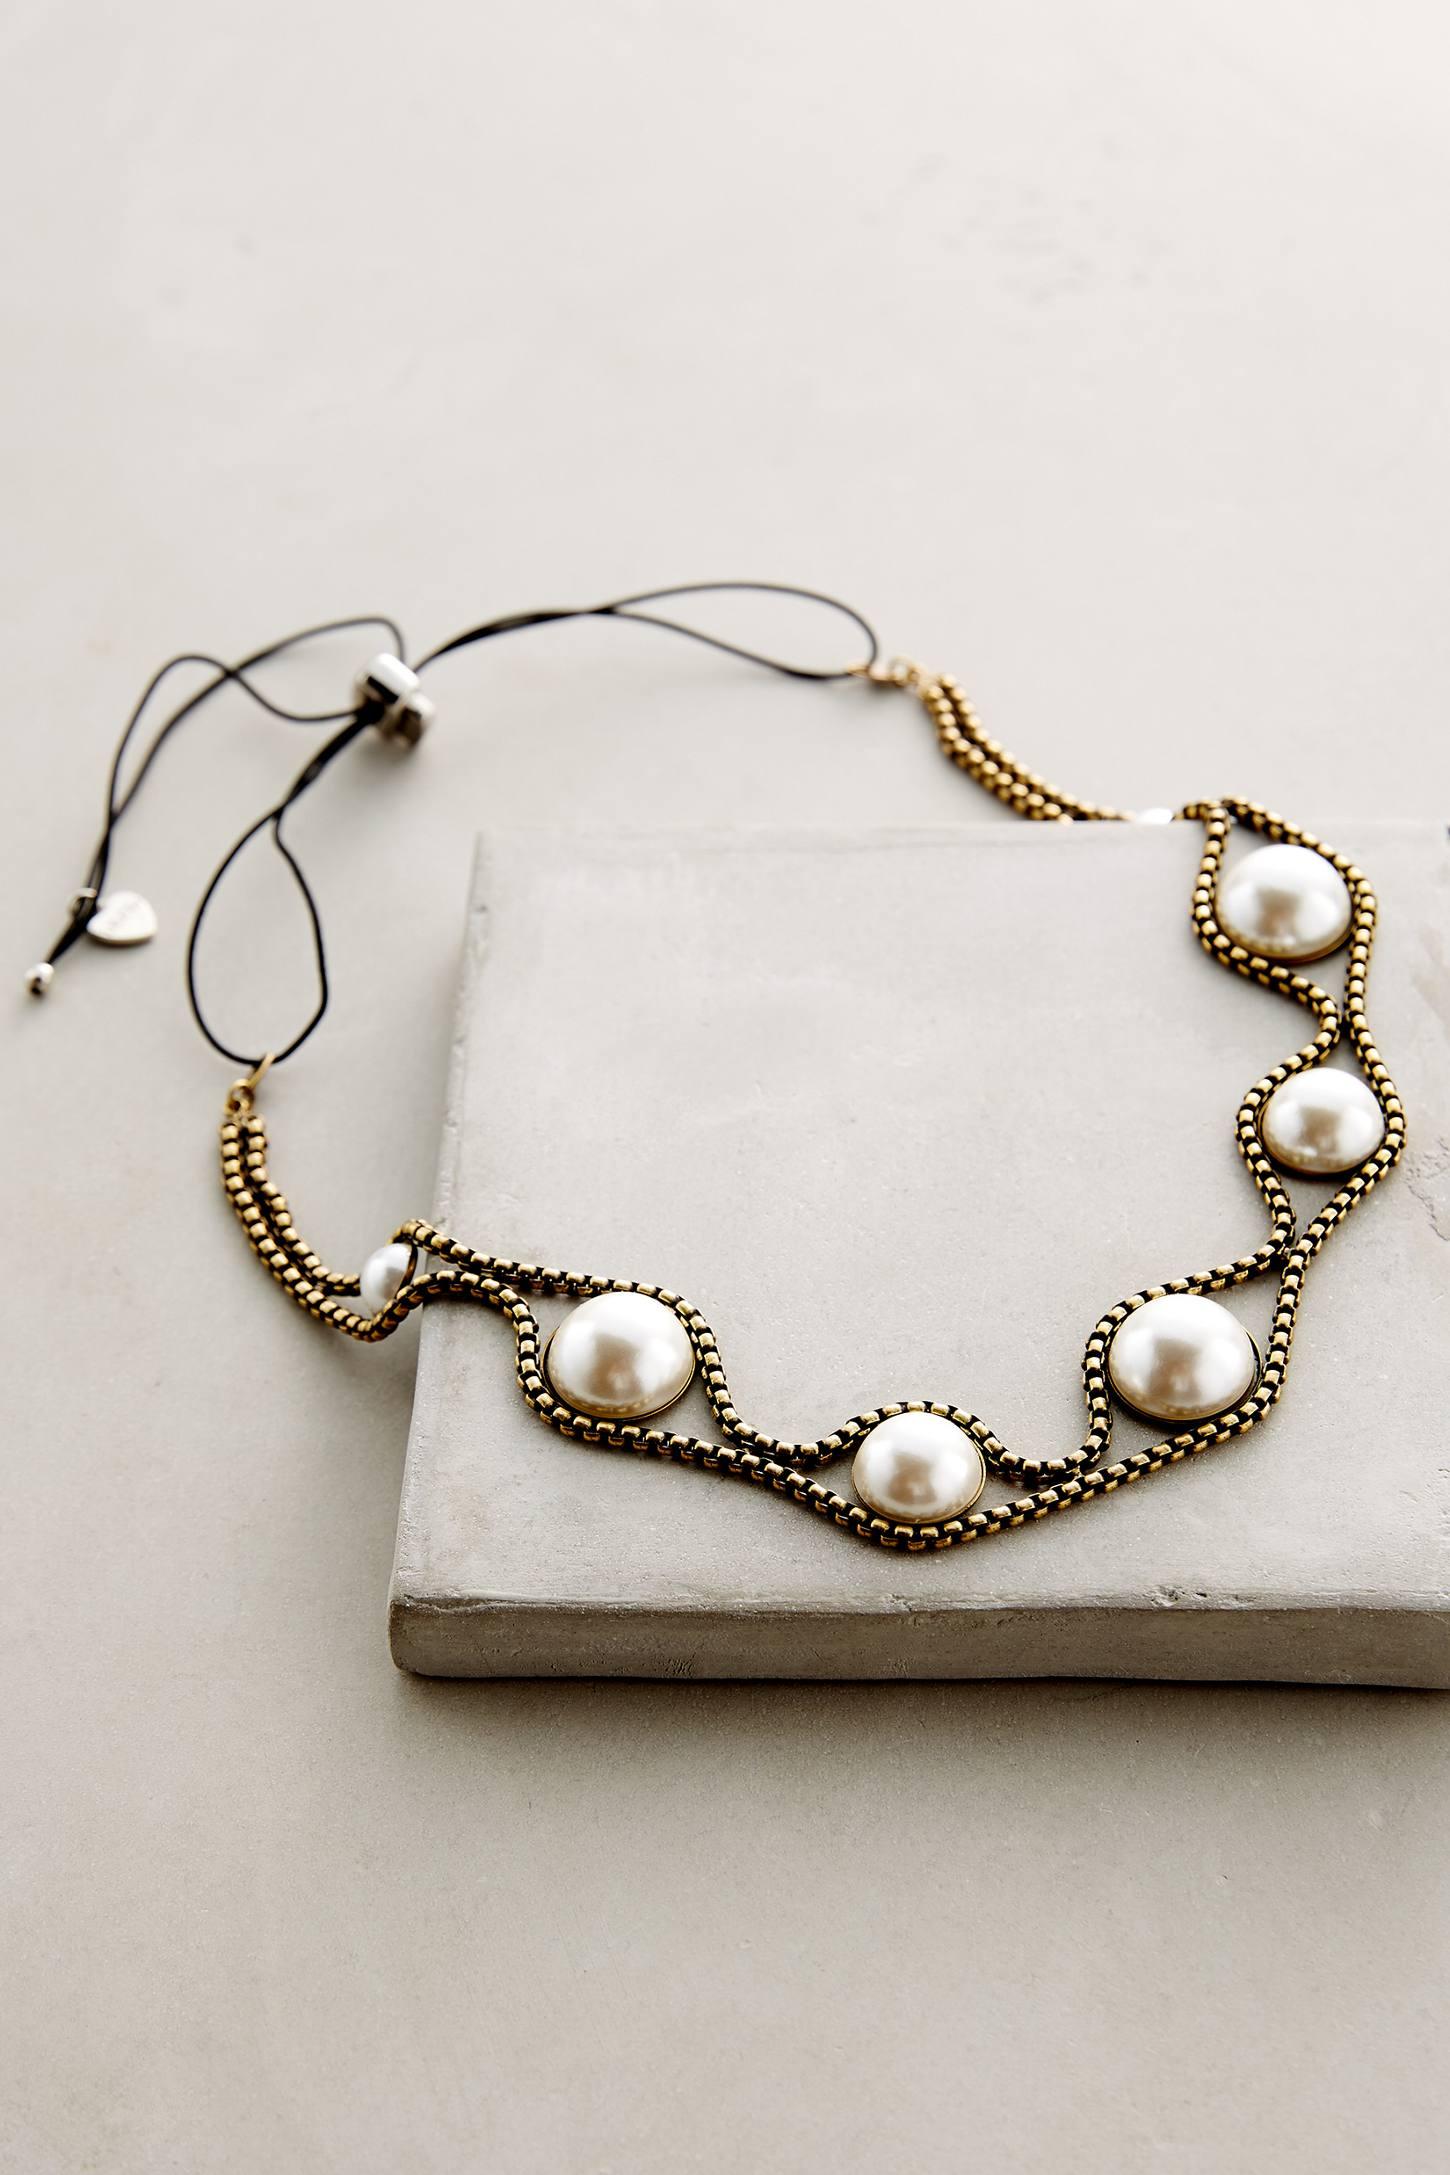 Anthropologies New Arrivals Summer Jewelry Topista